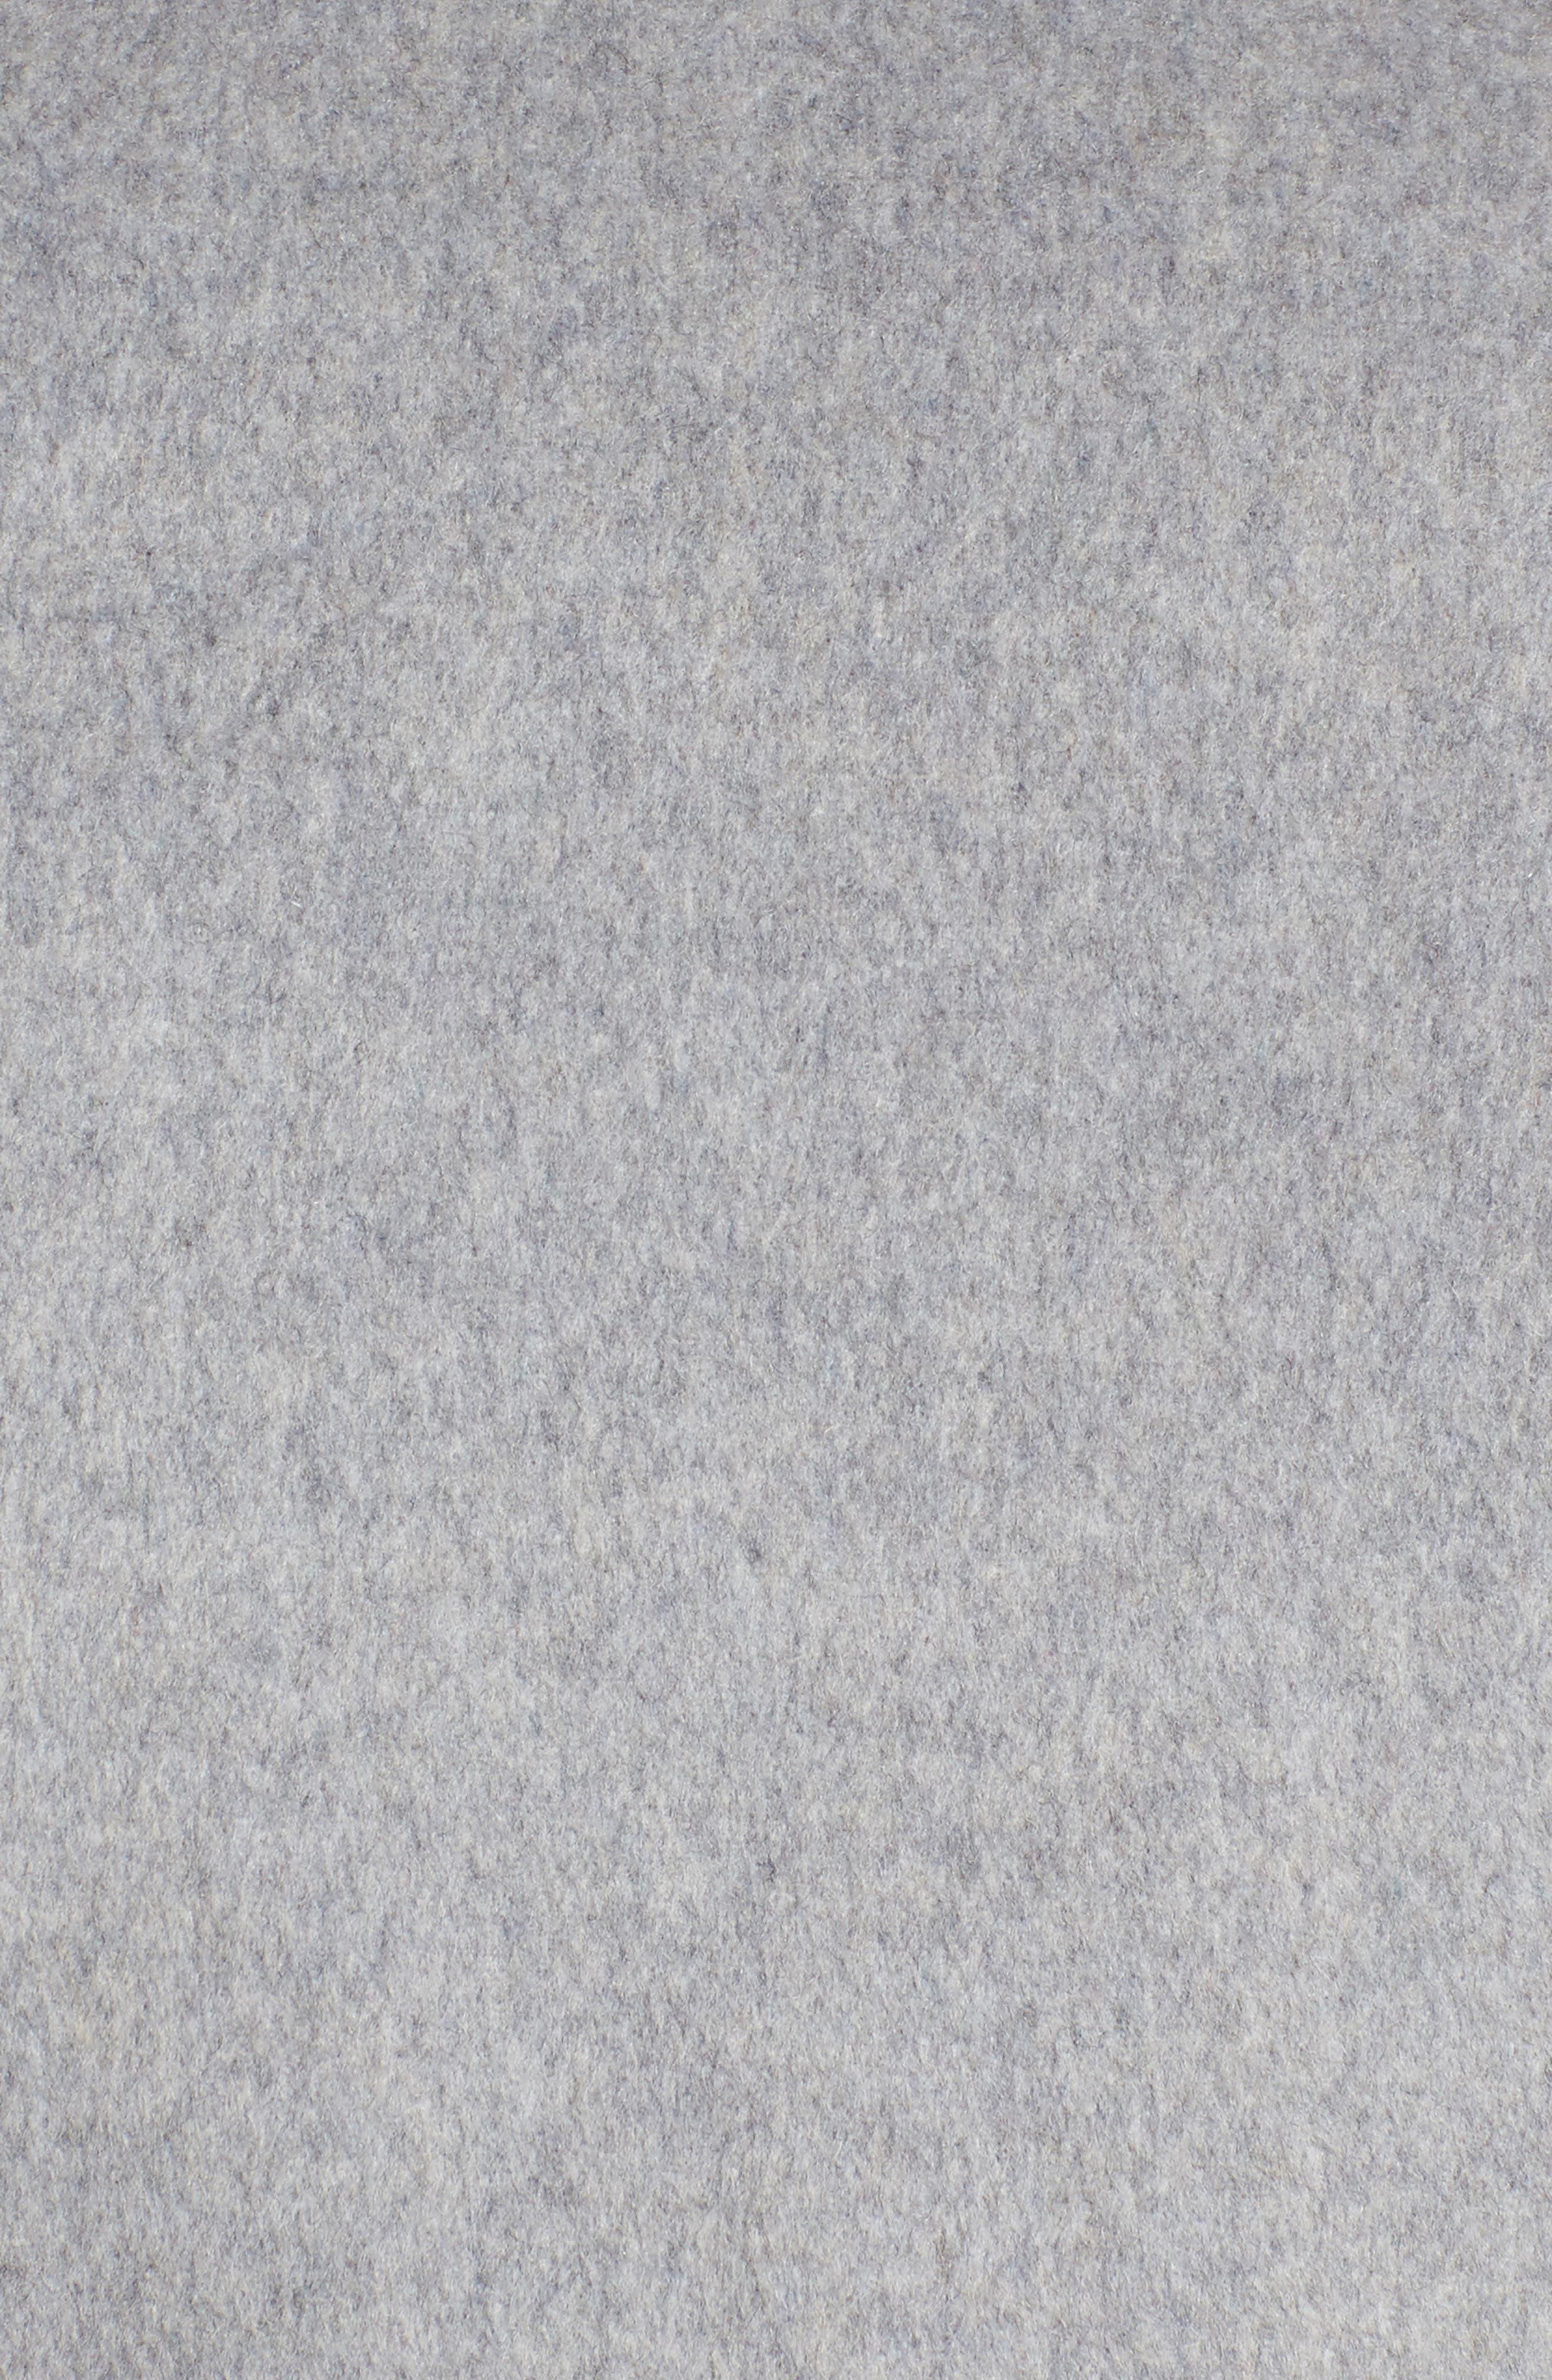 DKNY Wool Blend Wrap Coat,                             Alternate thumbnail 6, color,